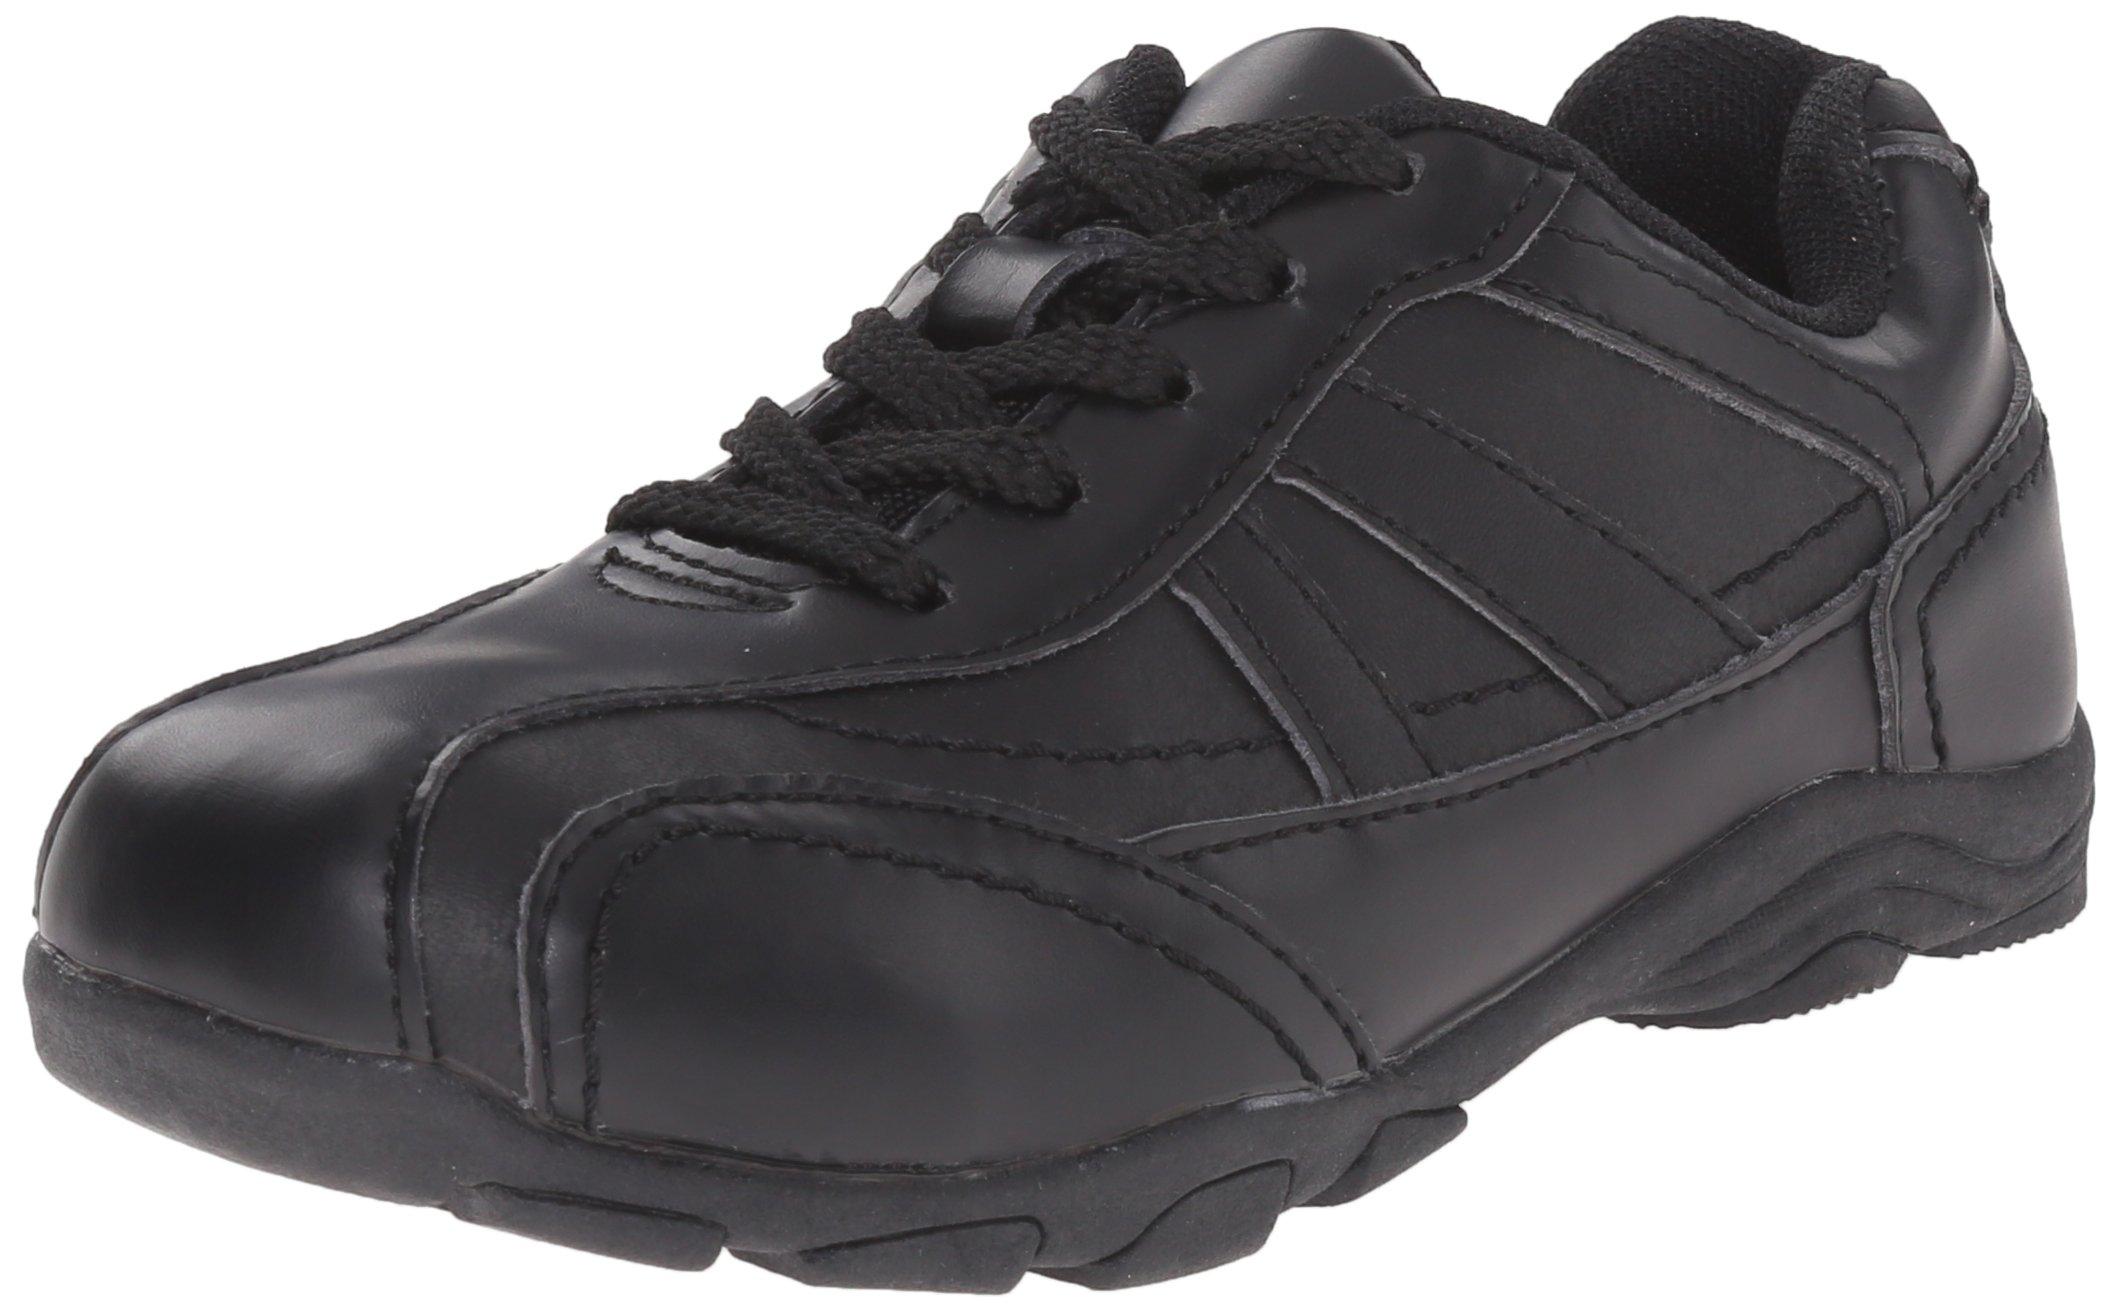 Classroom School Uniform Shoes Rover Trainer (Toddler/Little Kid/Big Kid),Black,11 M US Little Kid